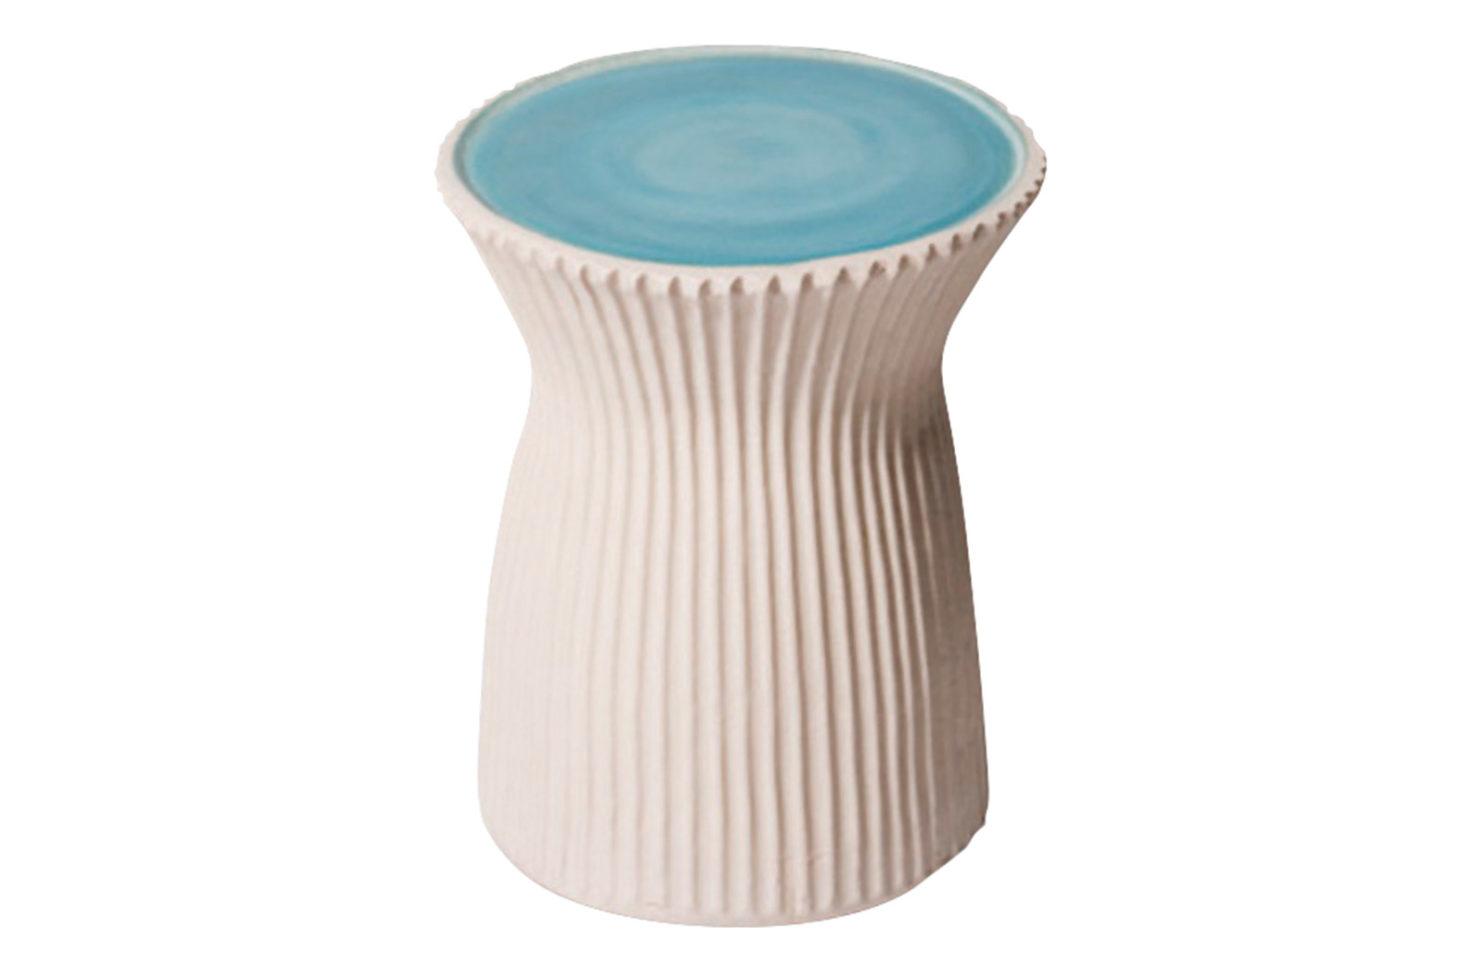 Ceramic ridged stool 308FT226P2TBSW